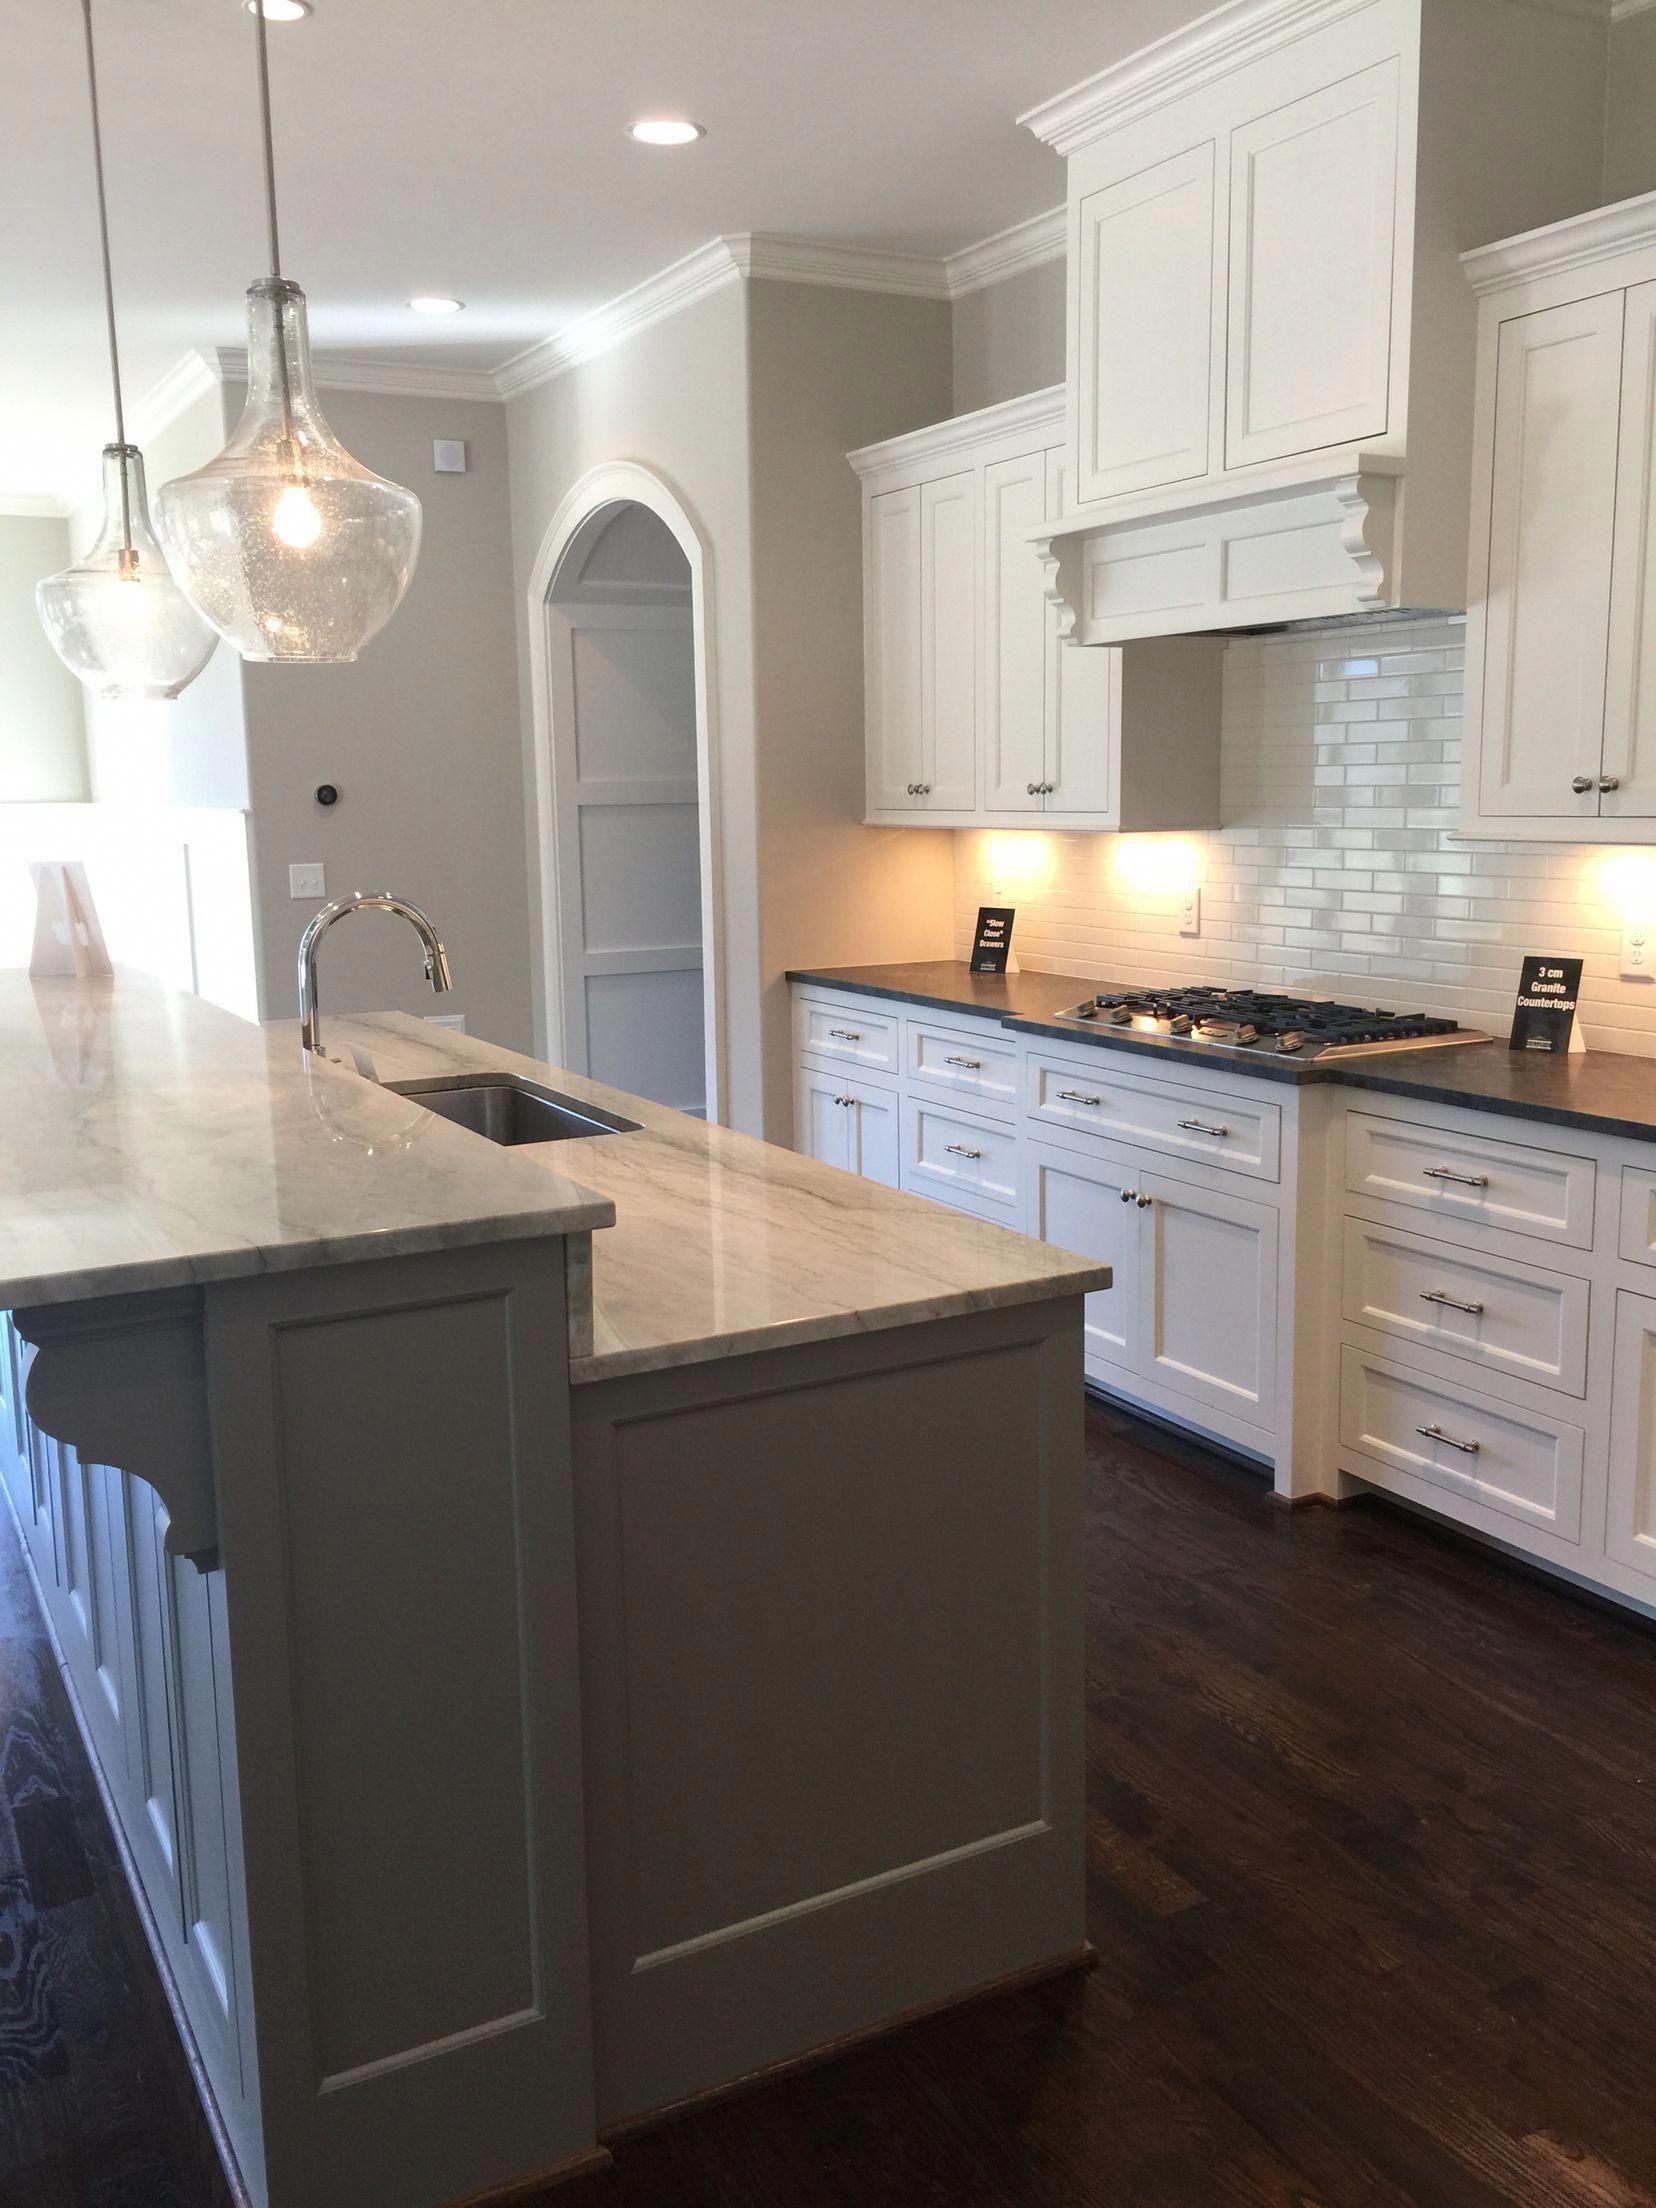 modern minimalist eclectic kitchen designs brass hardware california home insp modern on kitchen ideas minimalist id=84536